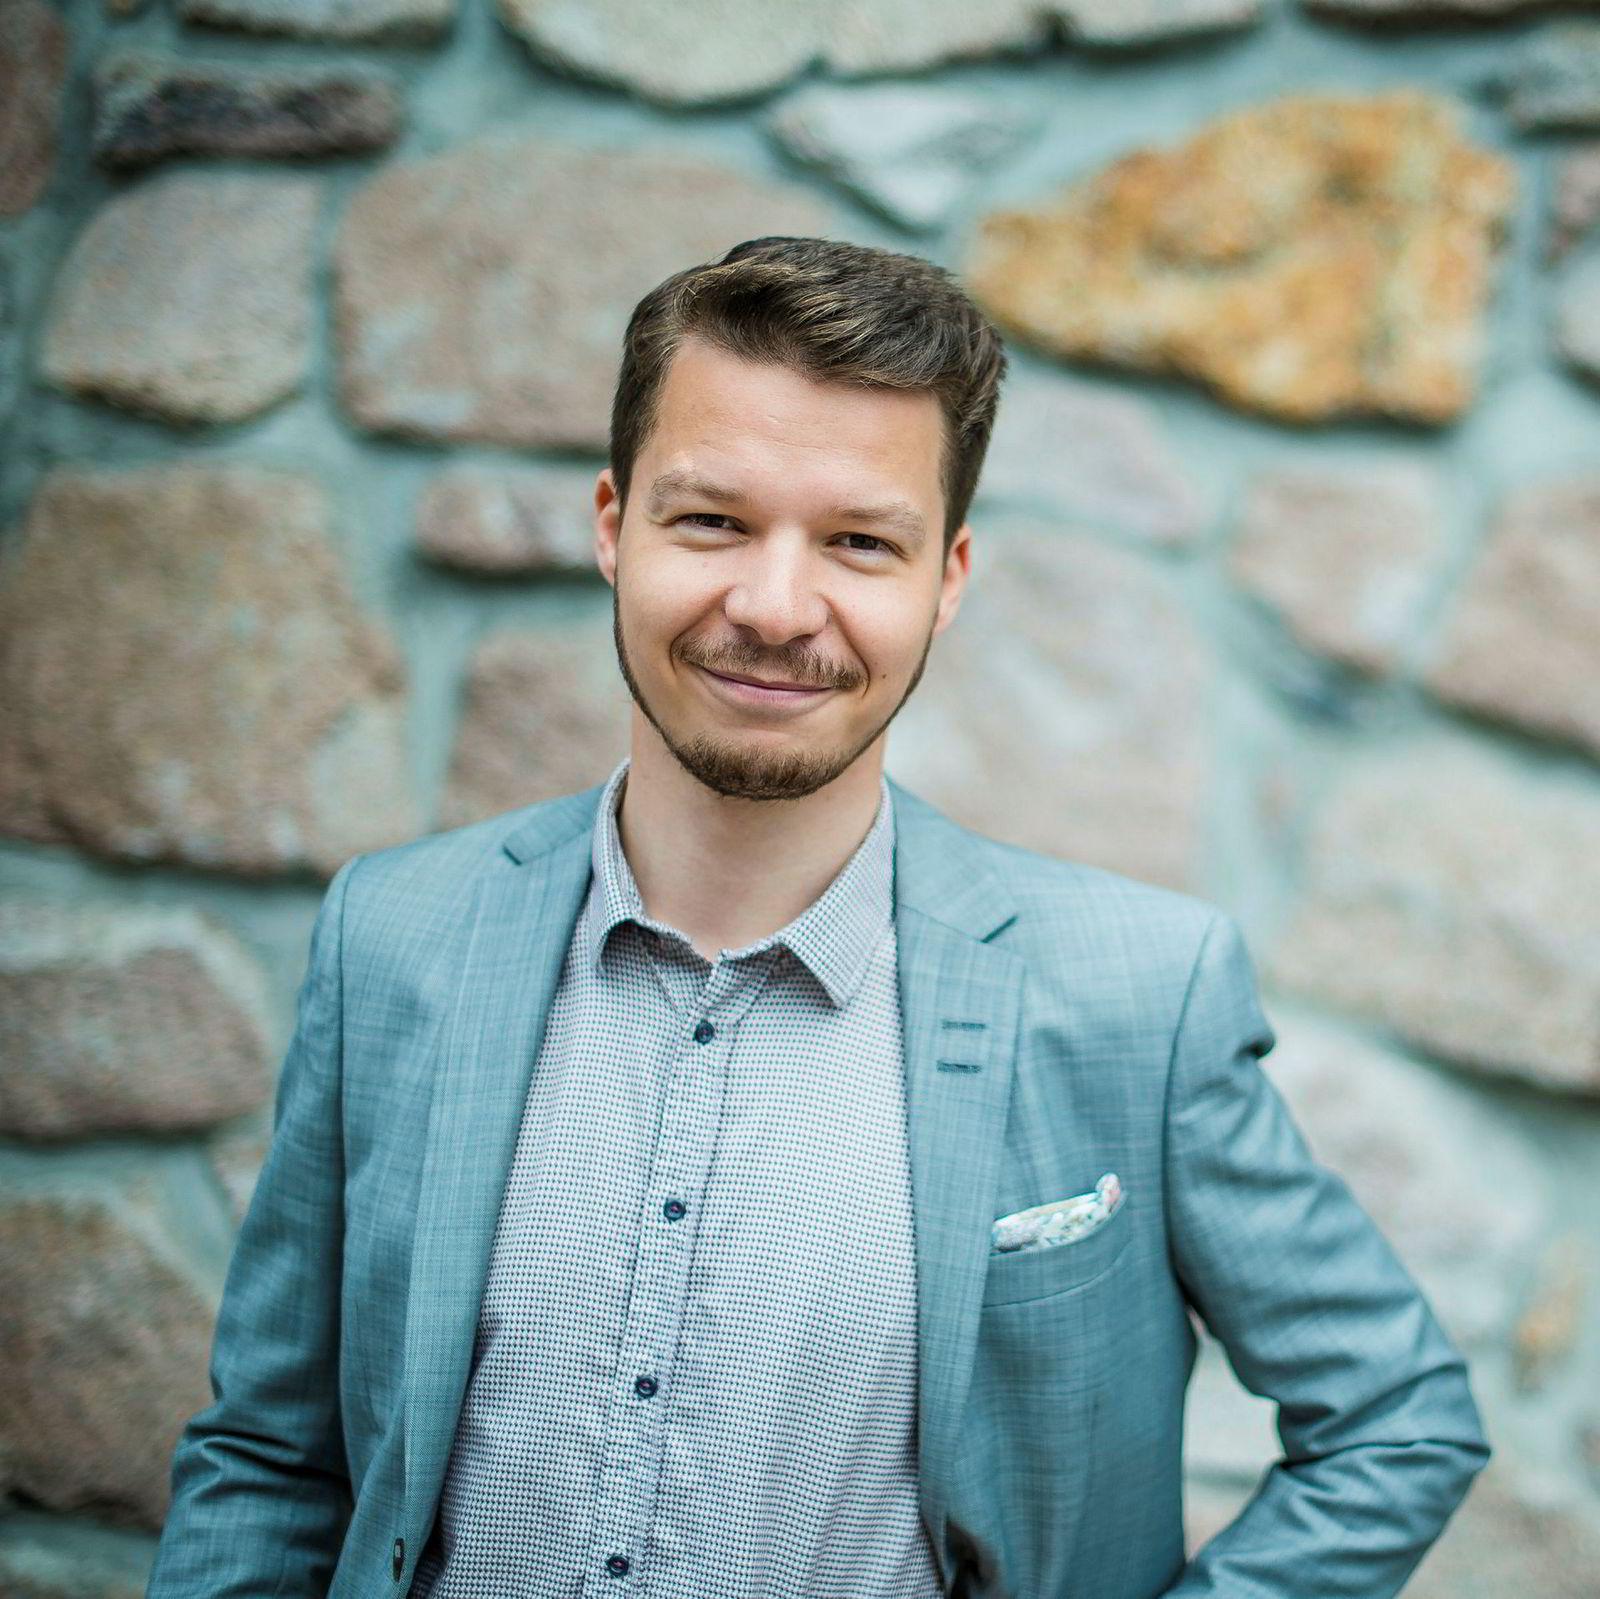 Produkt- og salgssjef Ivan Solhaug i Vårt Land.